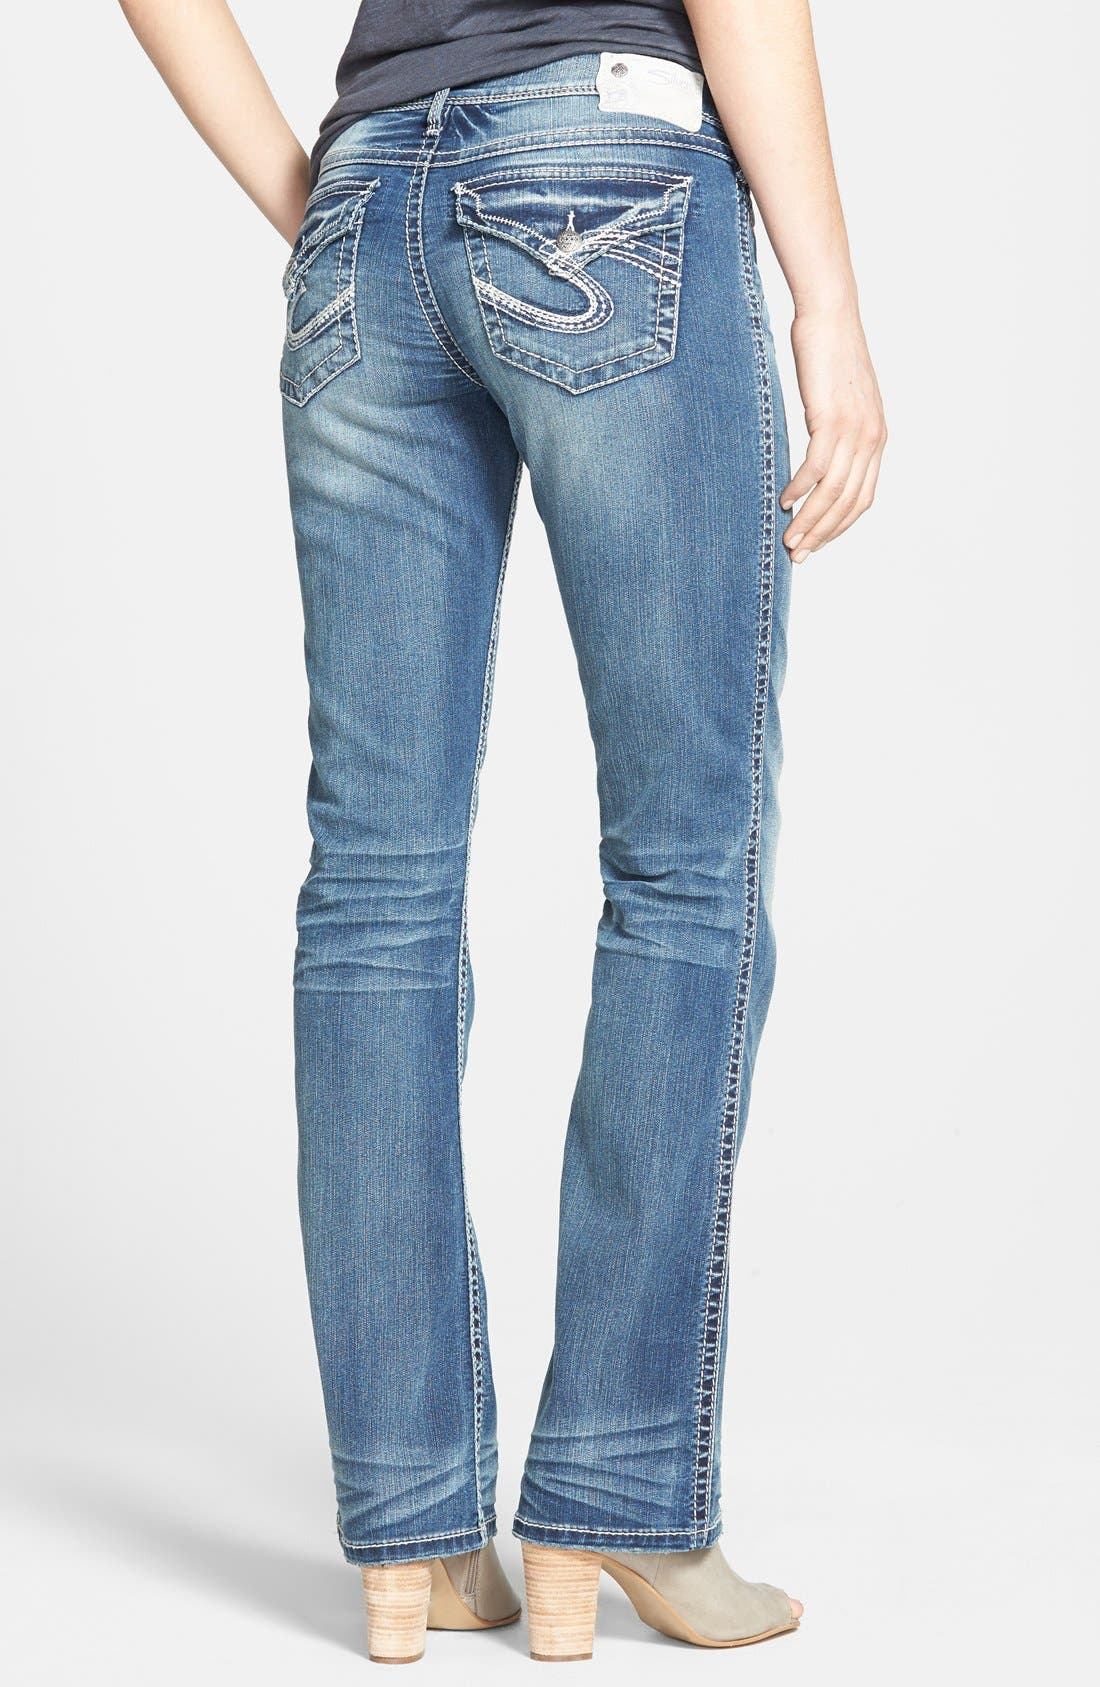 'Tuesday'  Flap Pocket Bootcut Jeans,                             Alternate thumbnail 2, color,                             402